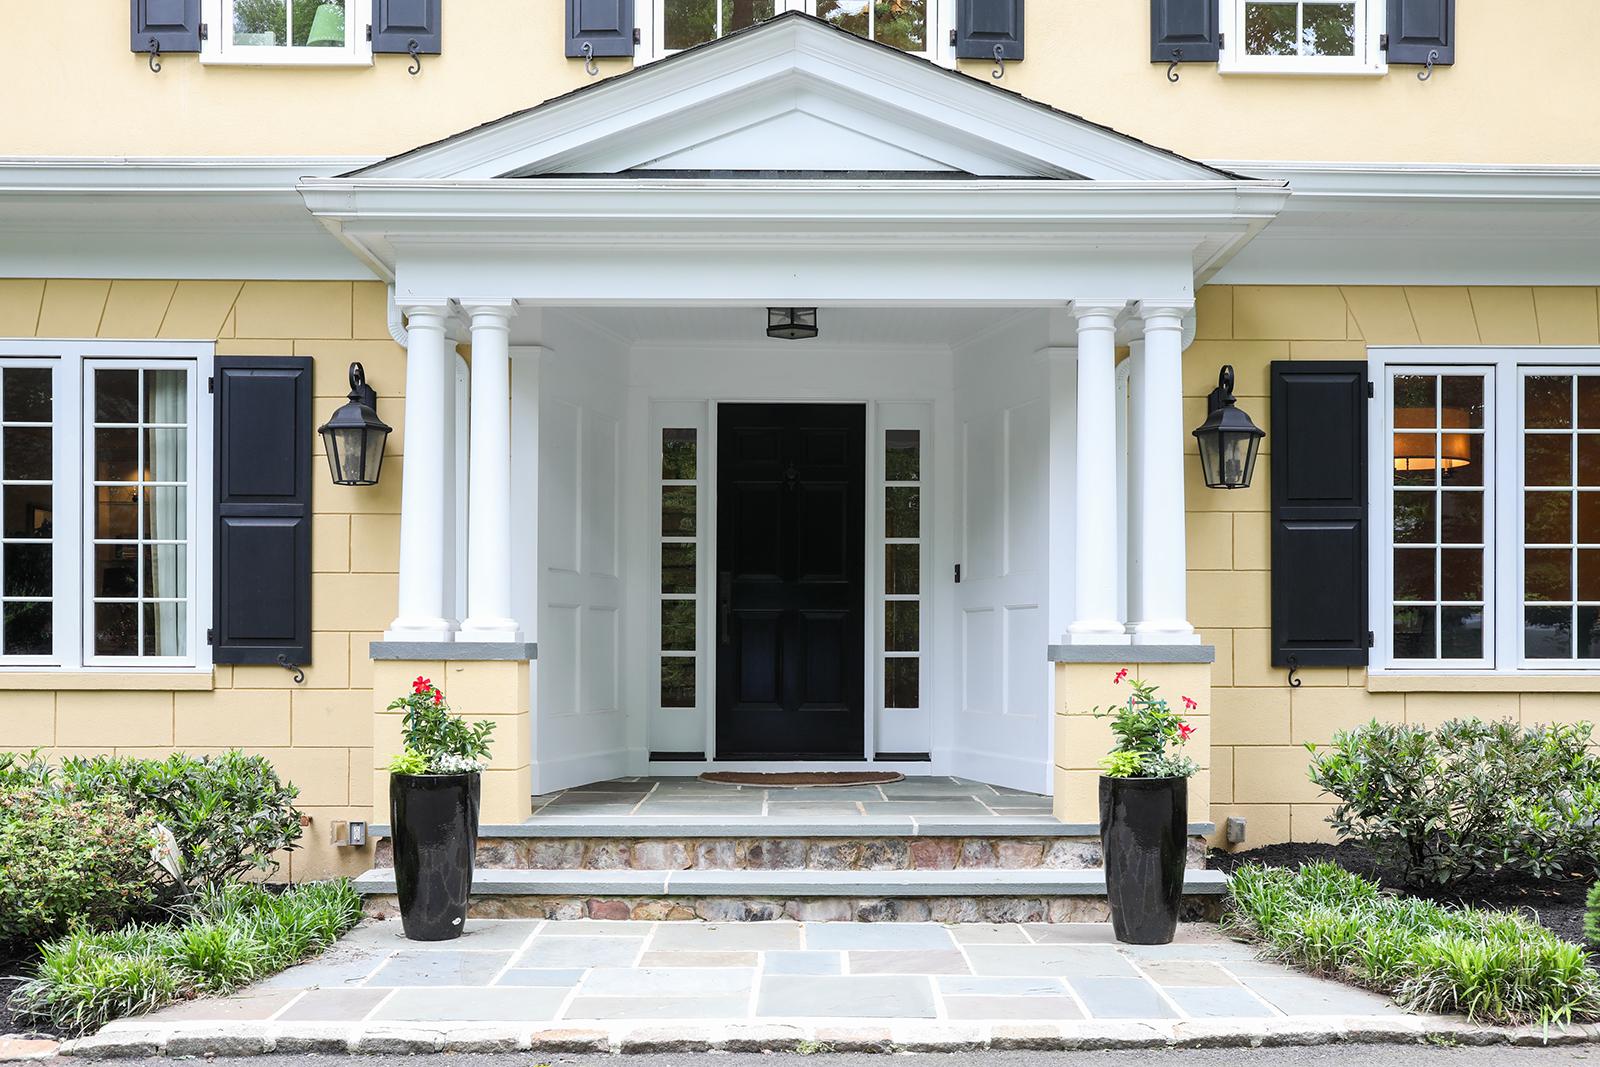 20 Parsonage Hill Rd, Short Hills • $2,345,000